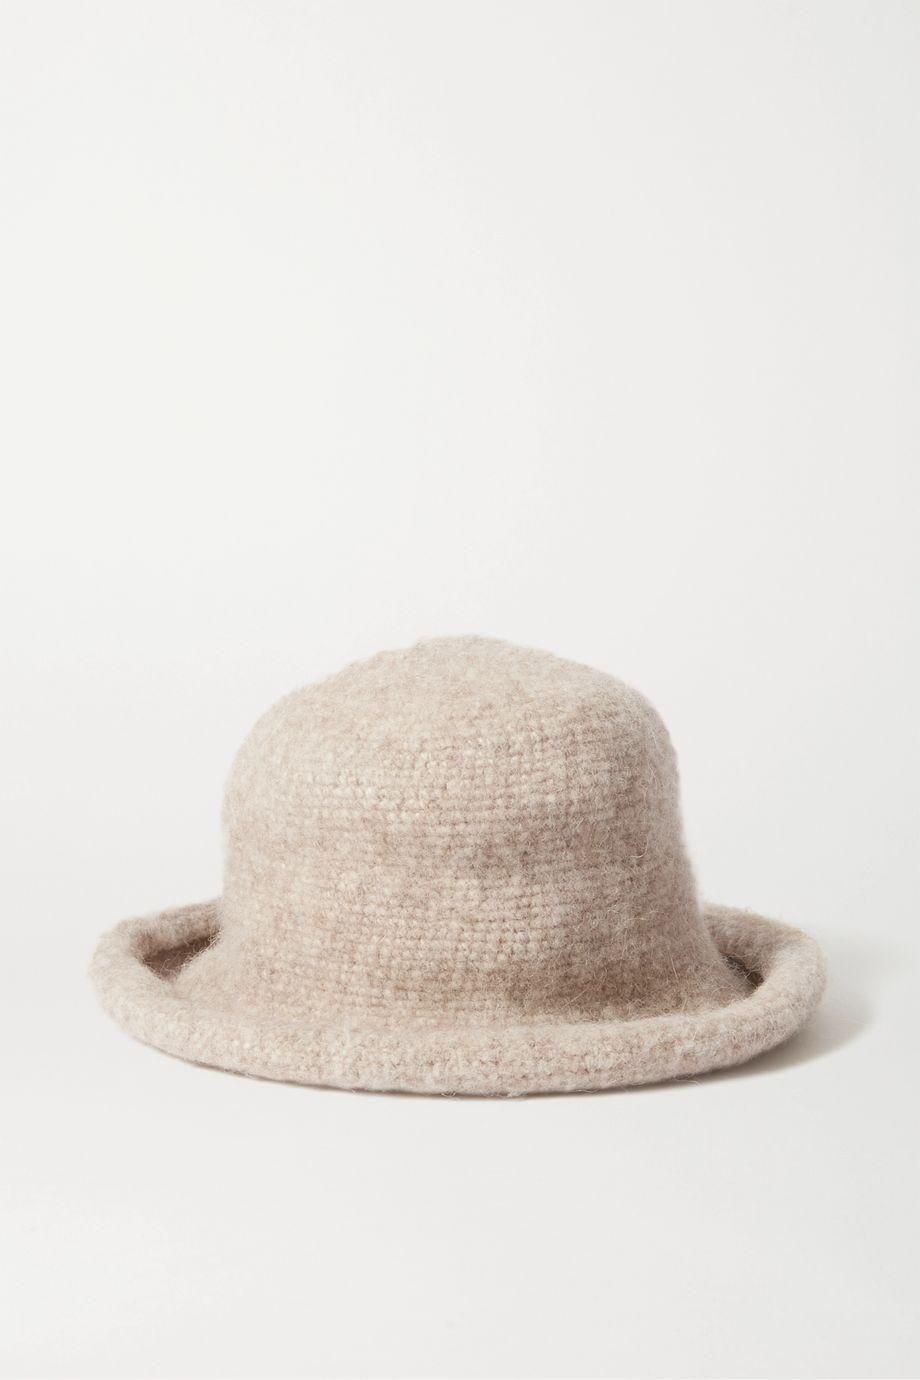 Lauren Manoogian Pima cotton, alpaca and wool-blend felt hat